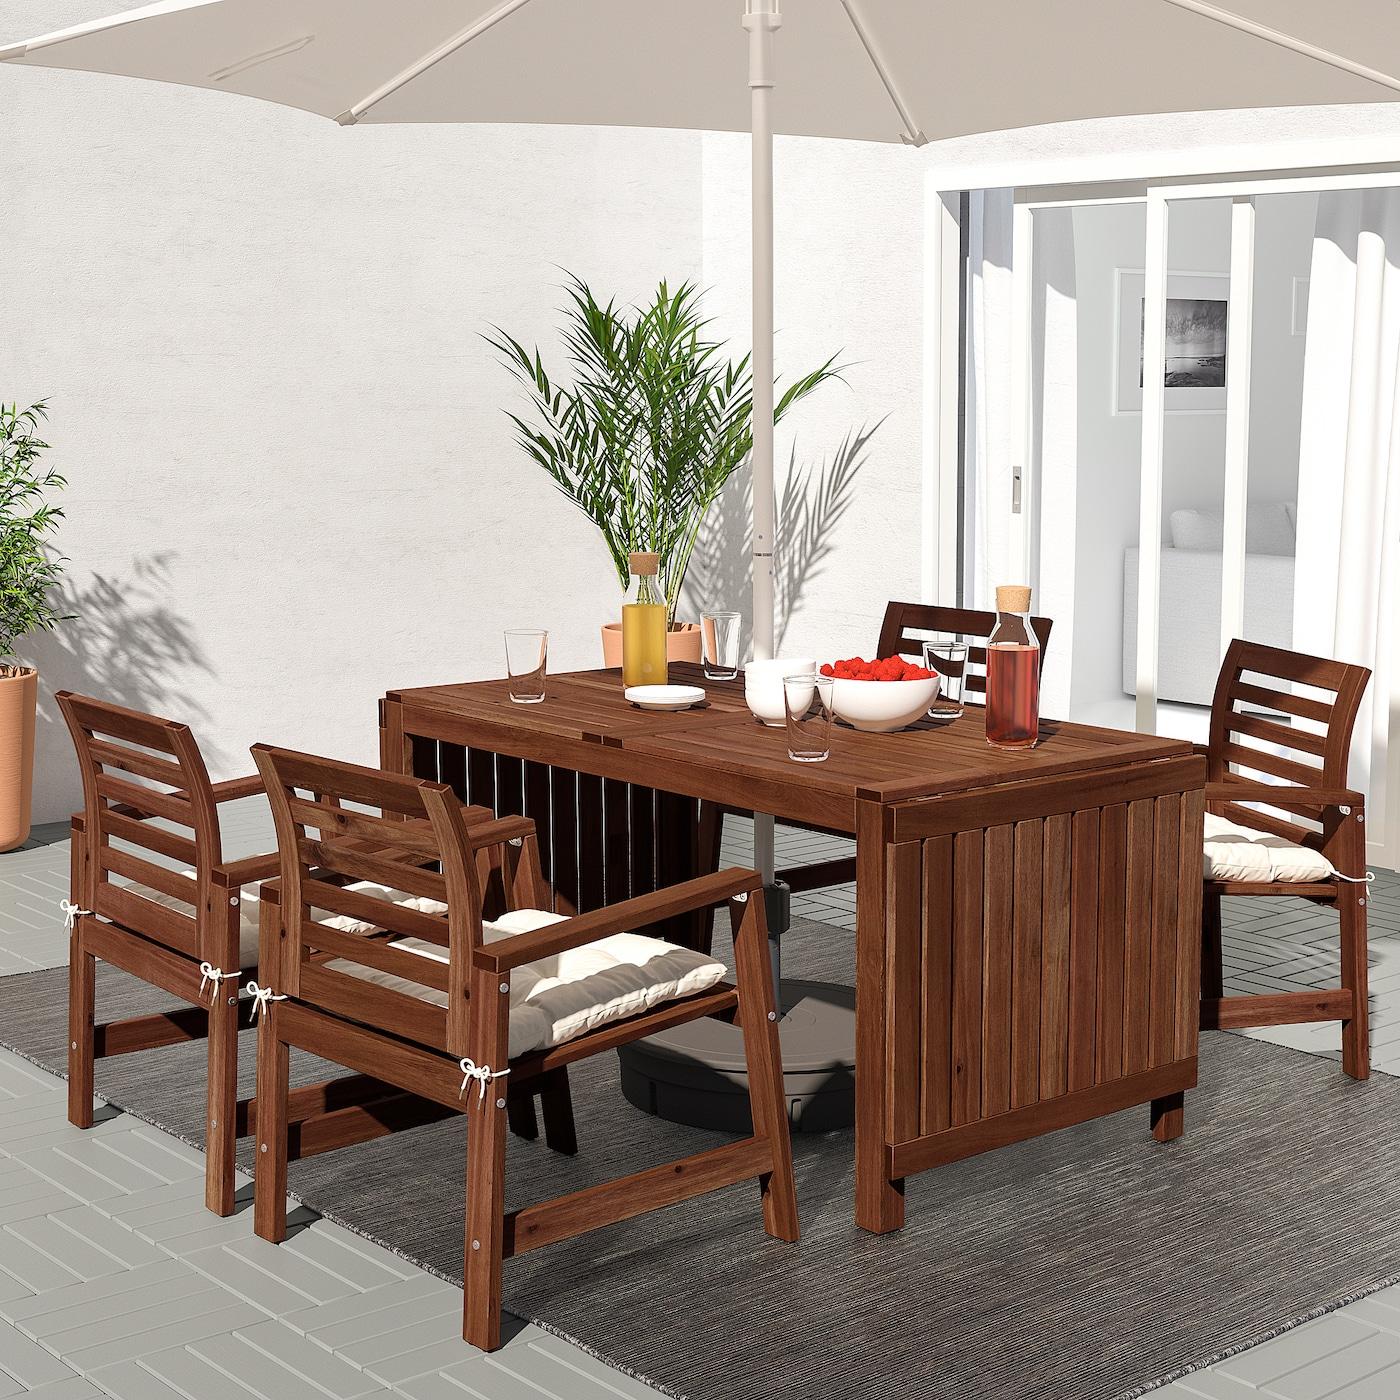 ÄPPLARÖ Armchair, outdoor - brown stained